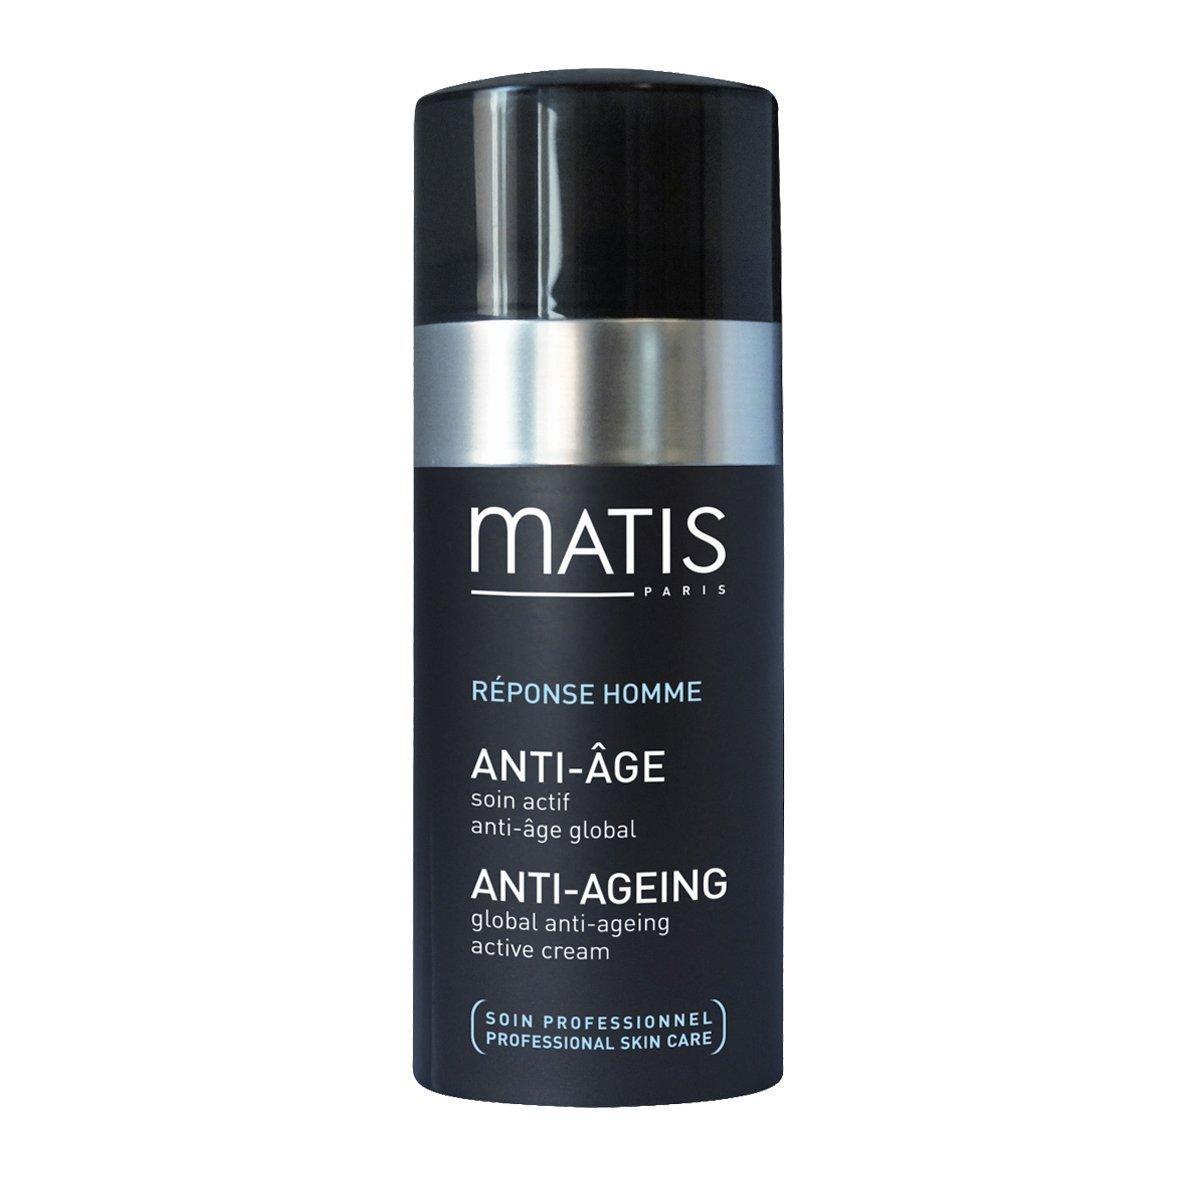 Reponse Homme by Matis Paris Global Anti Age Active Cream 50ml by Matis Paris